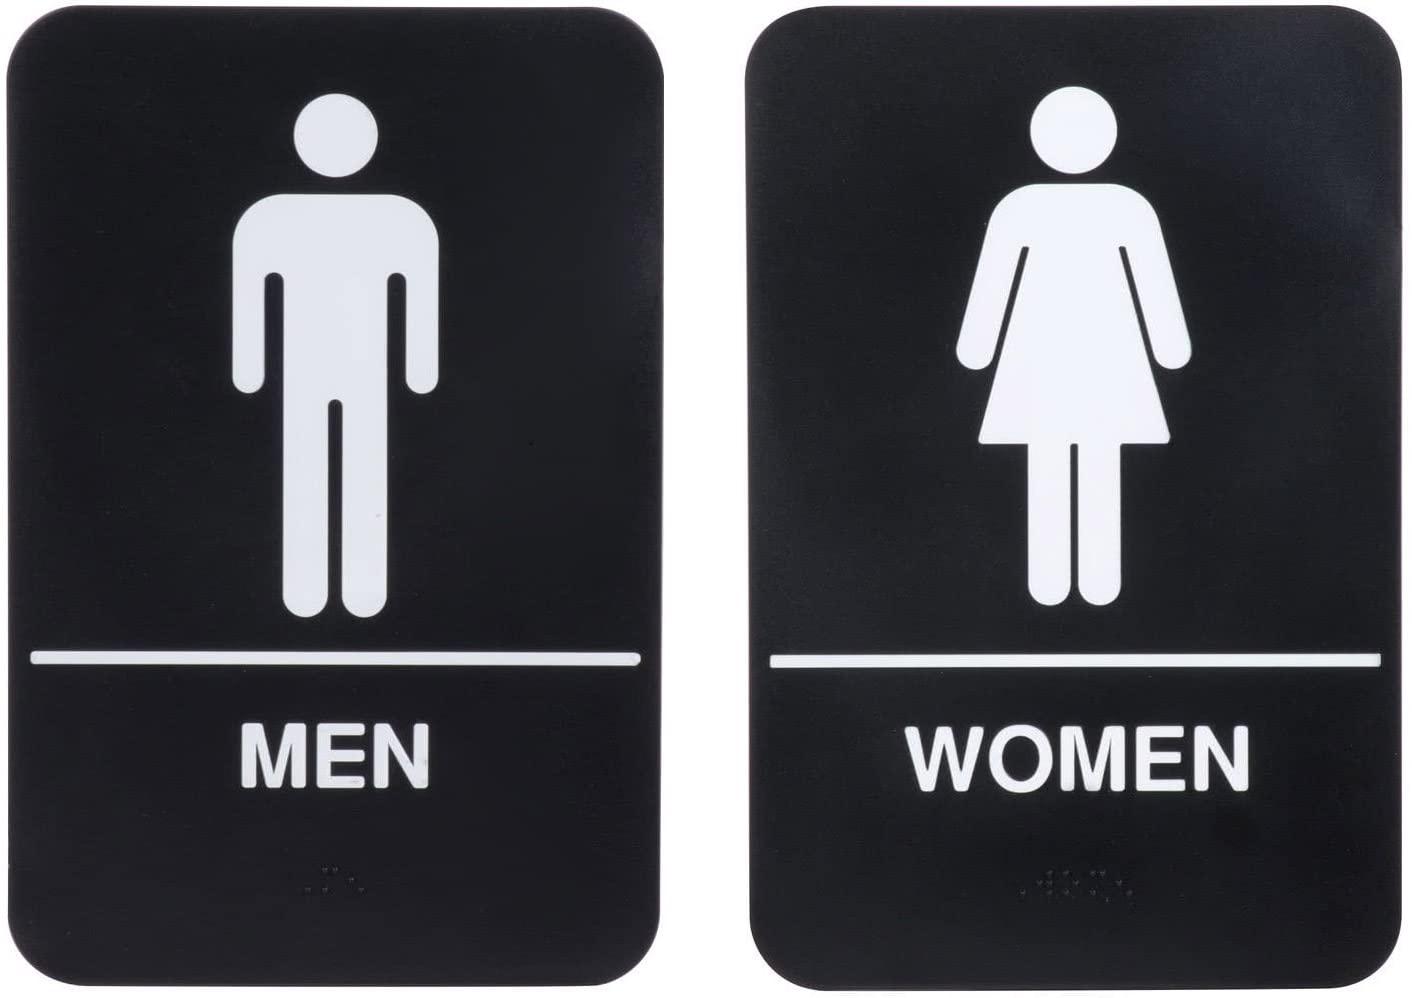 ADA Men and Women Restrooms Sign Set with Braille Toilet Door Plate for Business Restaurant, 6